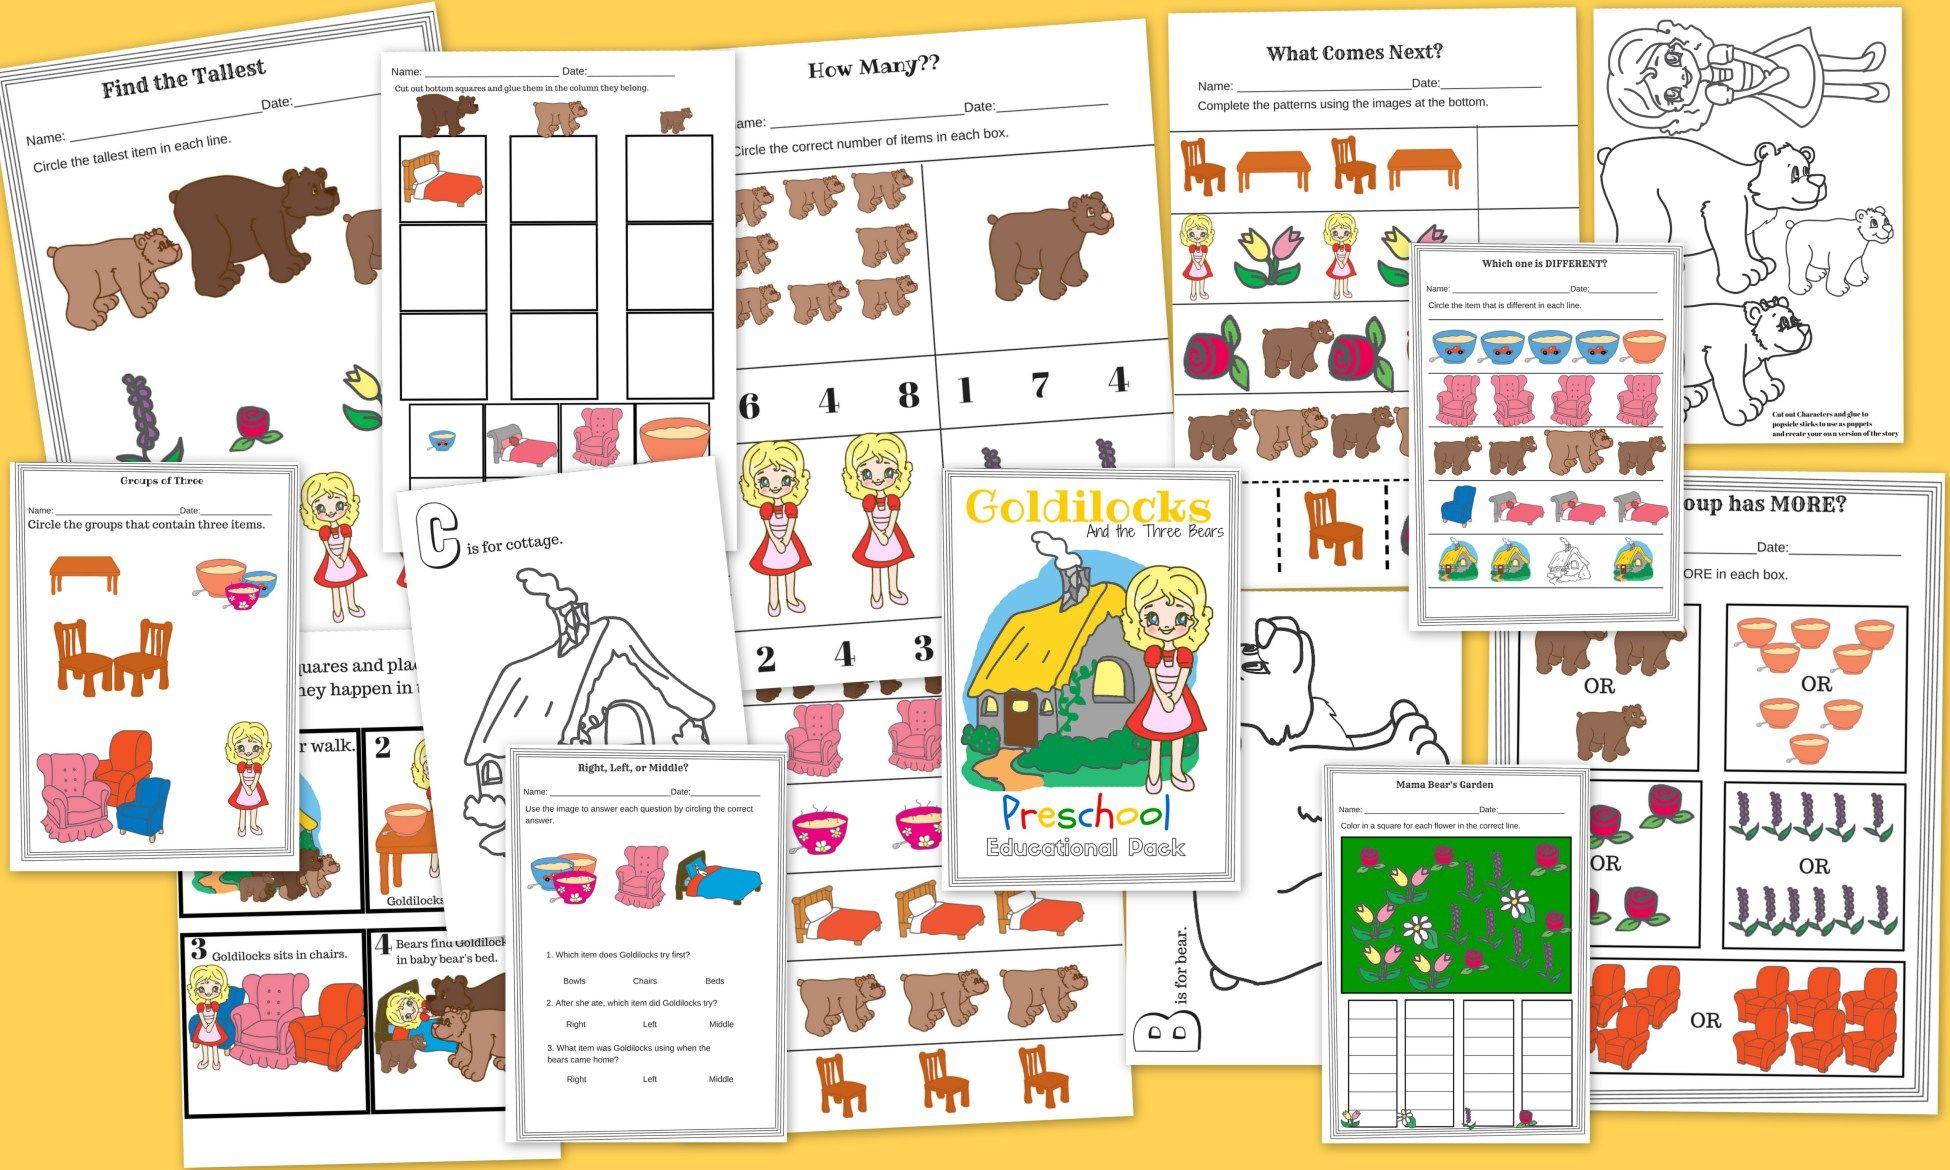 Goldilocks And The Three Bears Free 15 Page Preschool